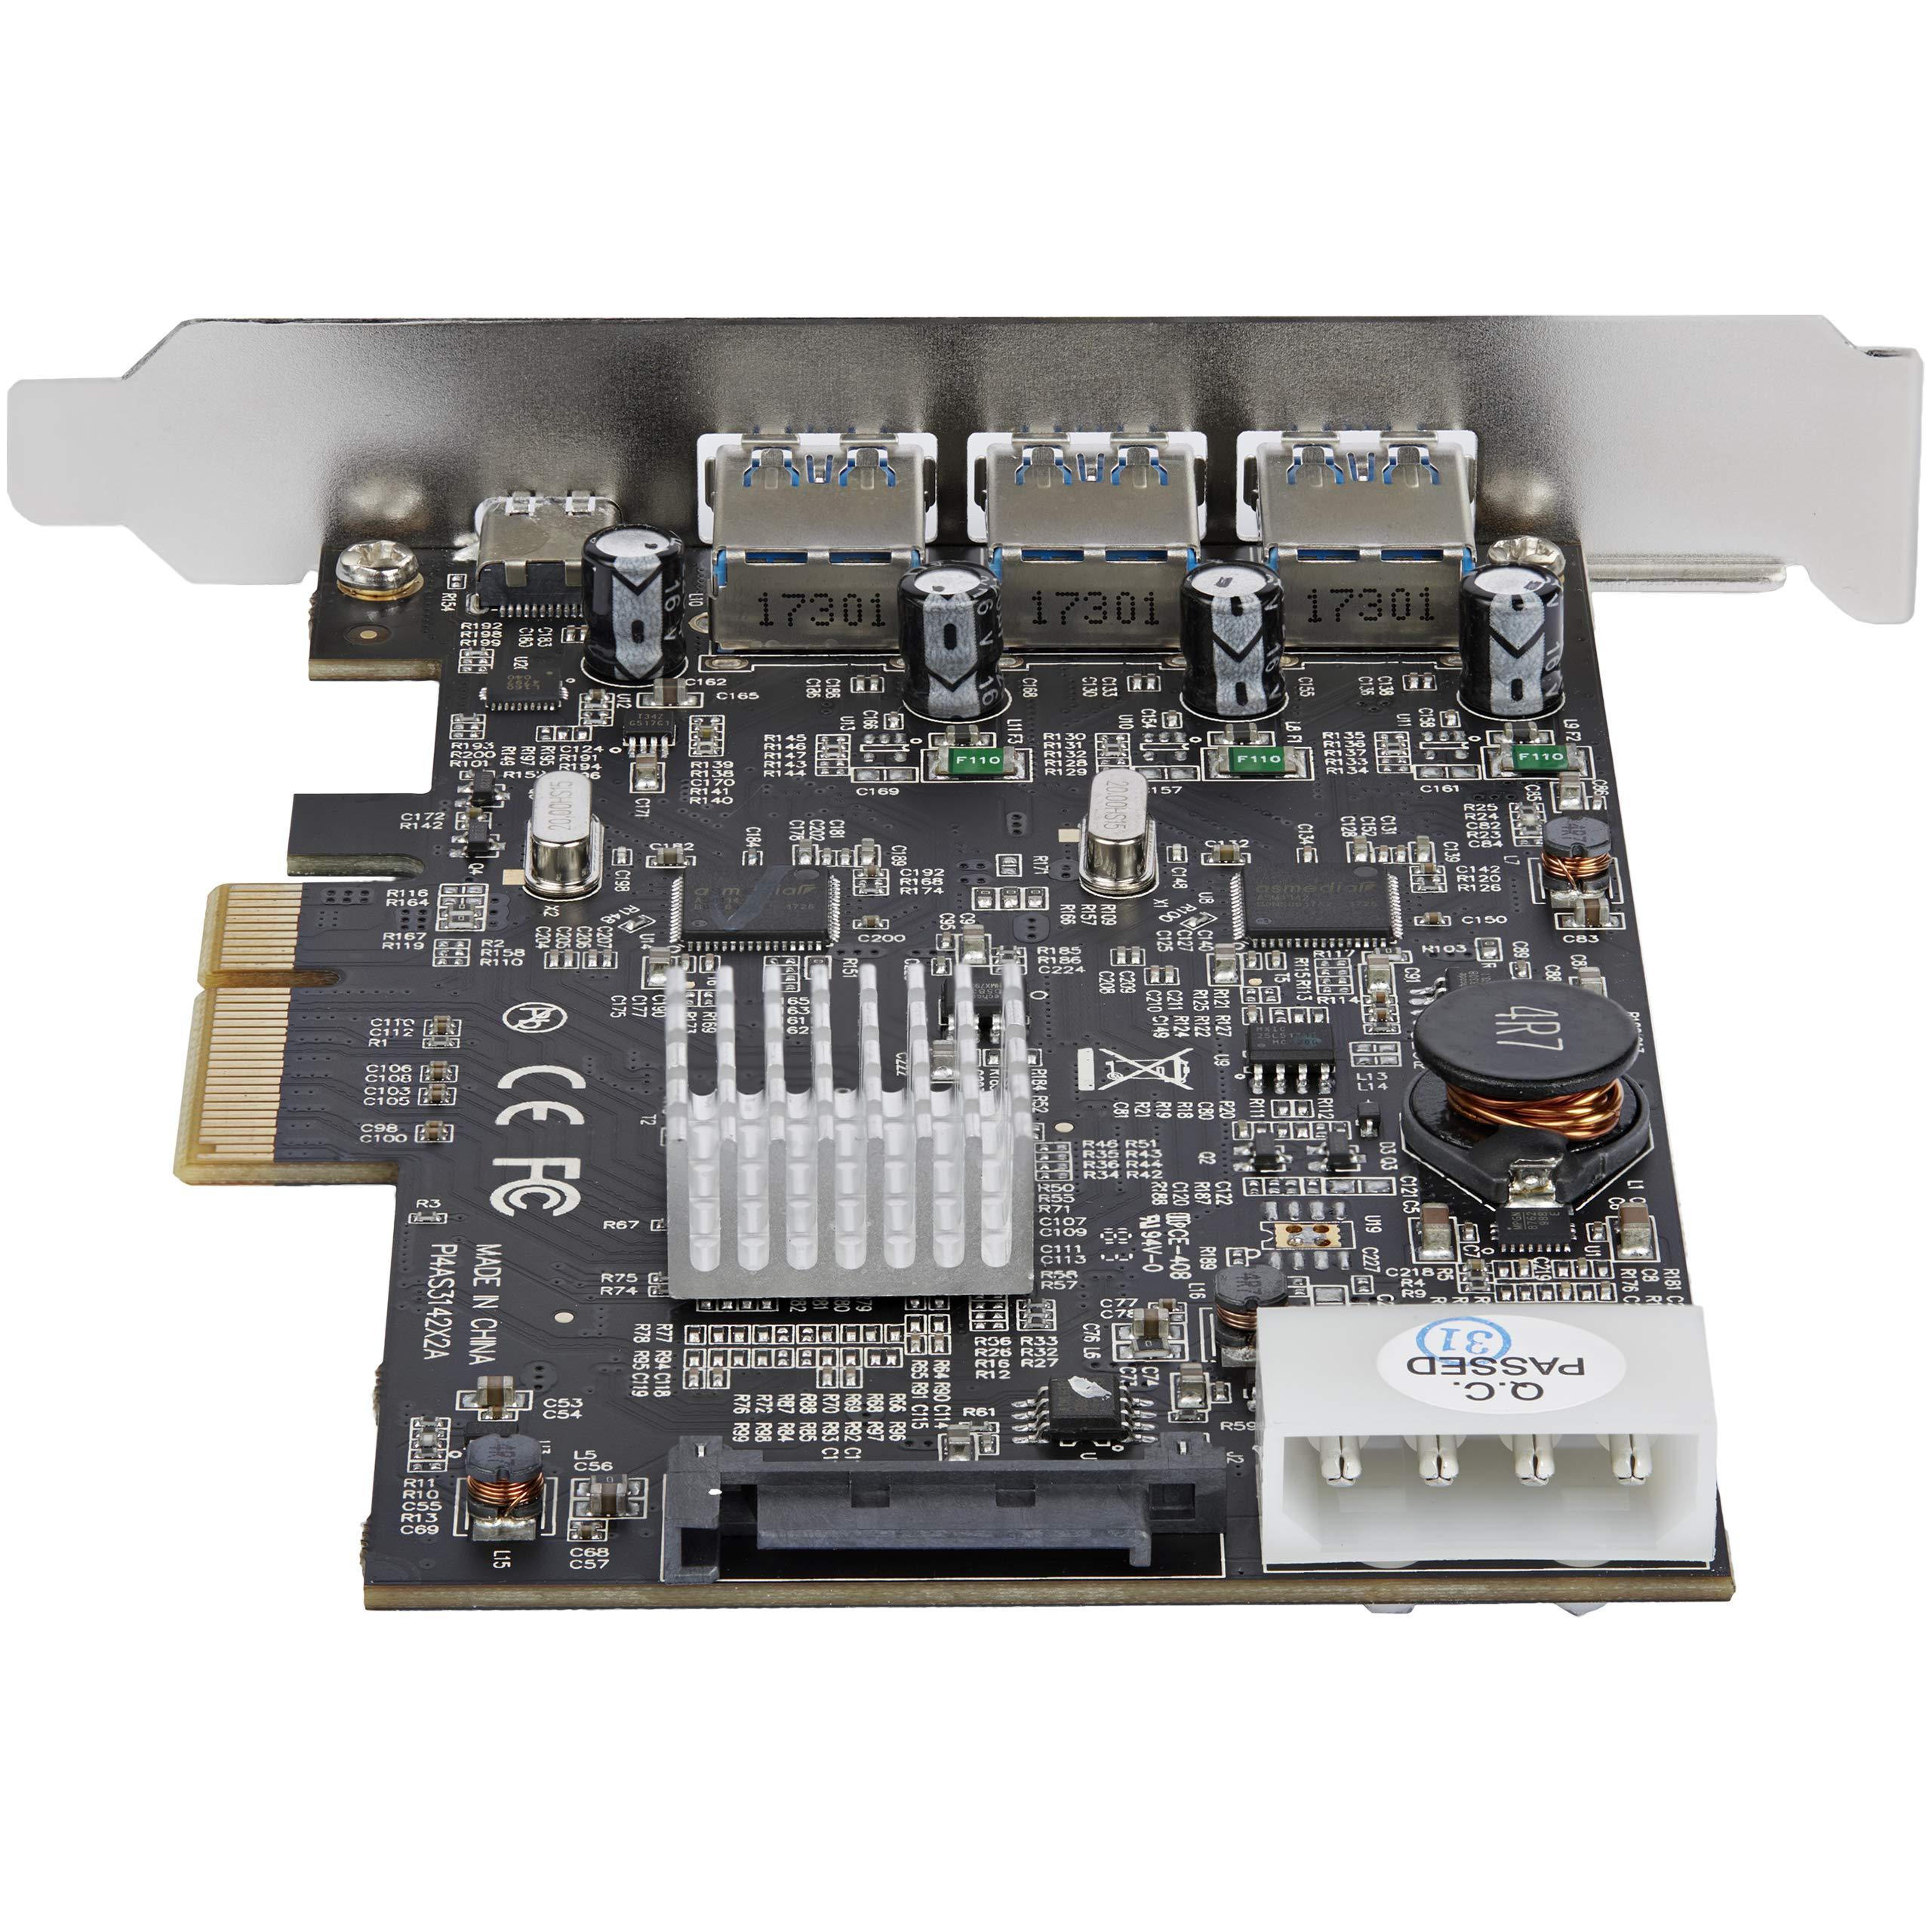 StarTech.com USB 3.1 PCIe Card - 3X USB-A and 1x USB-C - 2X Dedicated Channels - USB C PCIe Card - USB 3.1 Controller Card (PEXUS313AC2V) by StarTech (Image #3)